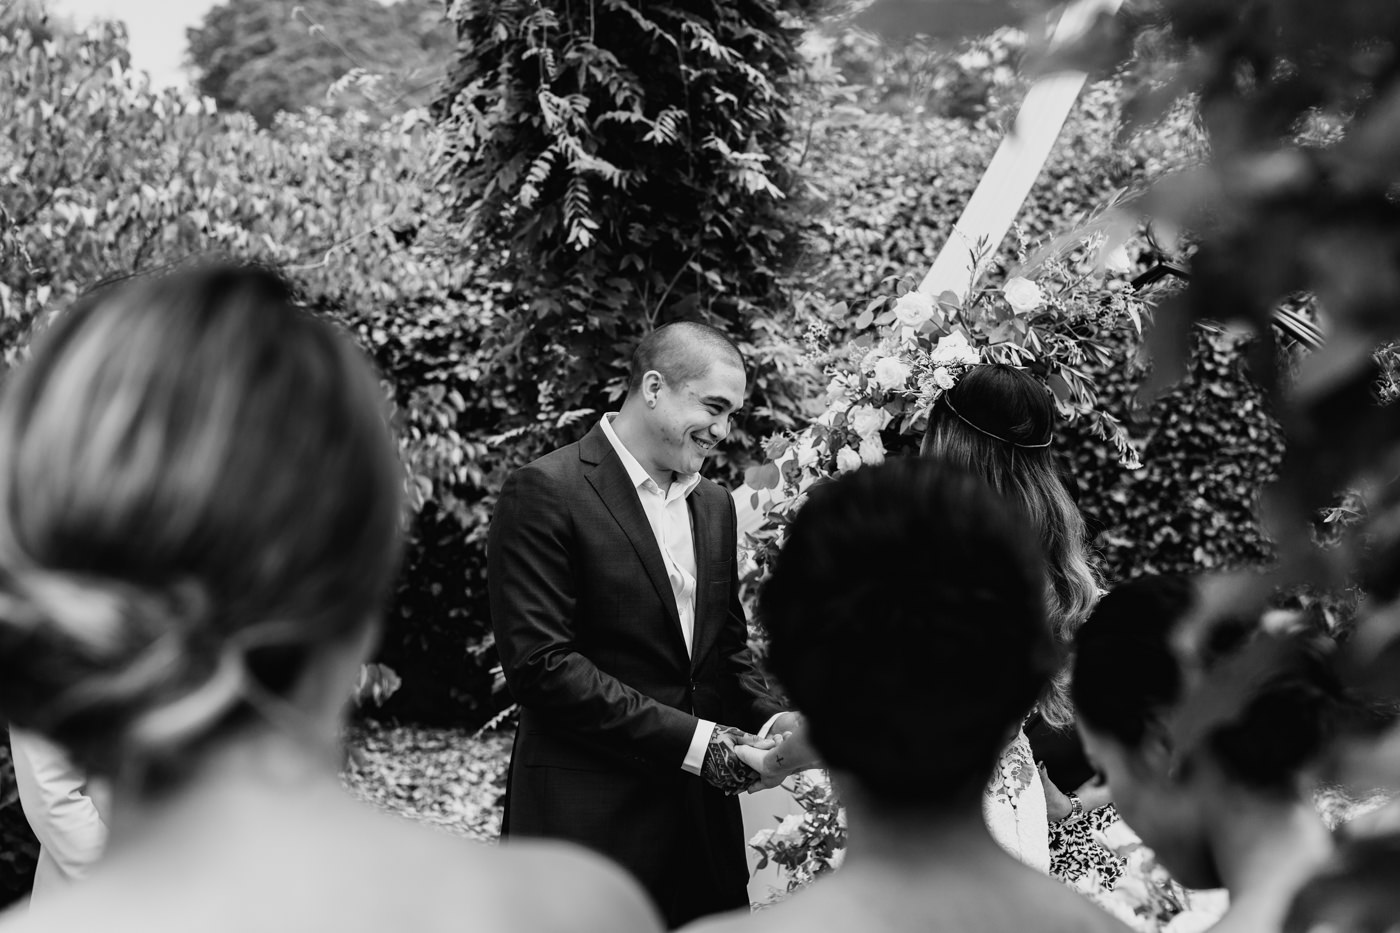 Nick & Vanezza - Fernbank Farm Wedding - Samantha Heather Photography-60.jpg